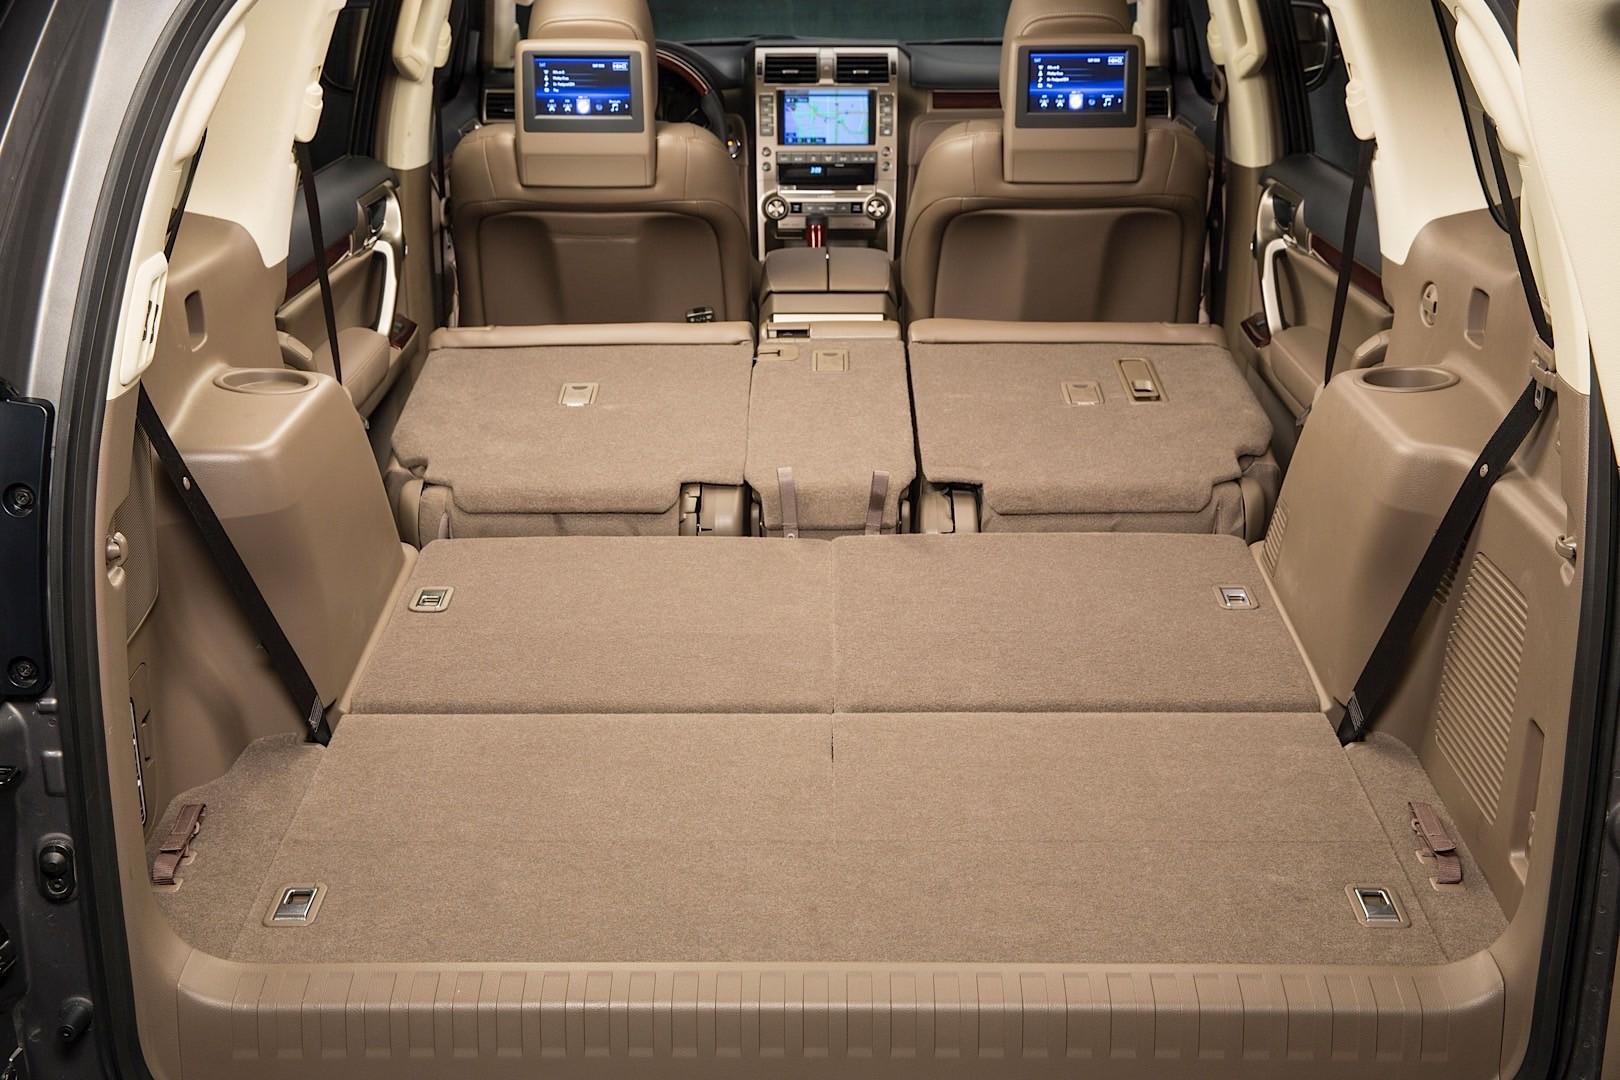 Lexus Lx 570 2017 Interior >> 2016 Lexus GX 460 and CT 200h Receive Enform Remote and Minor Polishes - autoevolution